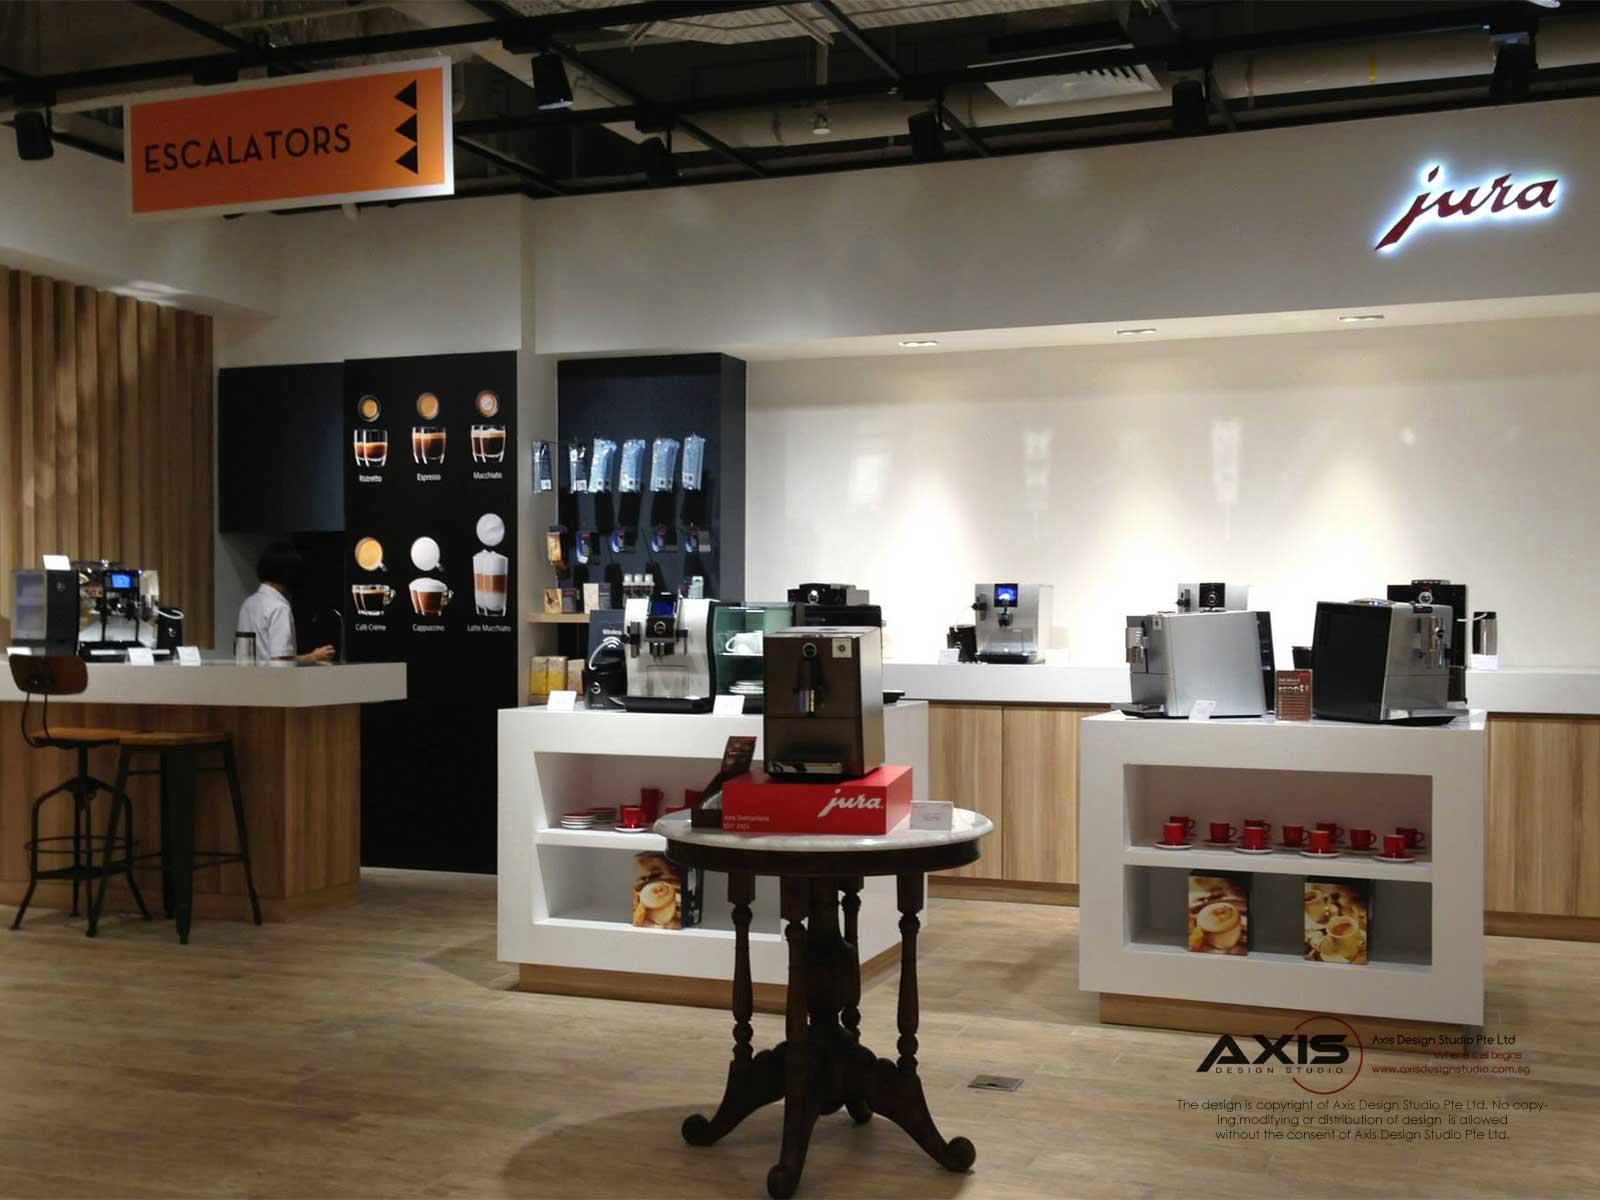 Jura Retail Pop-up Store